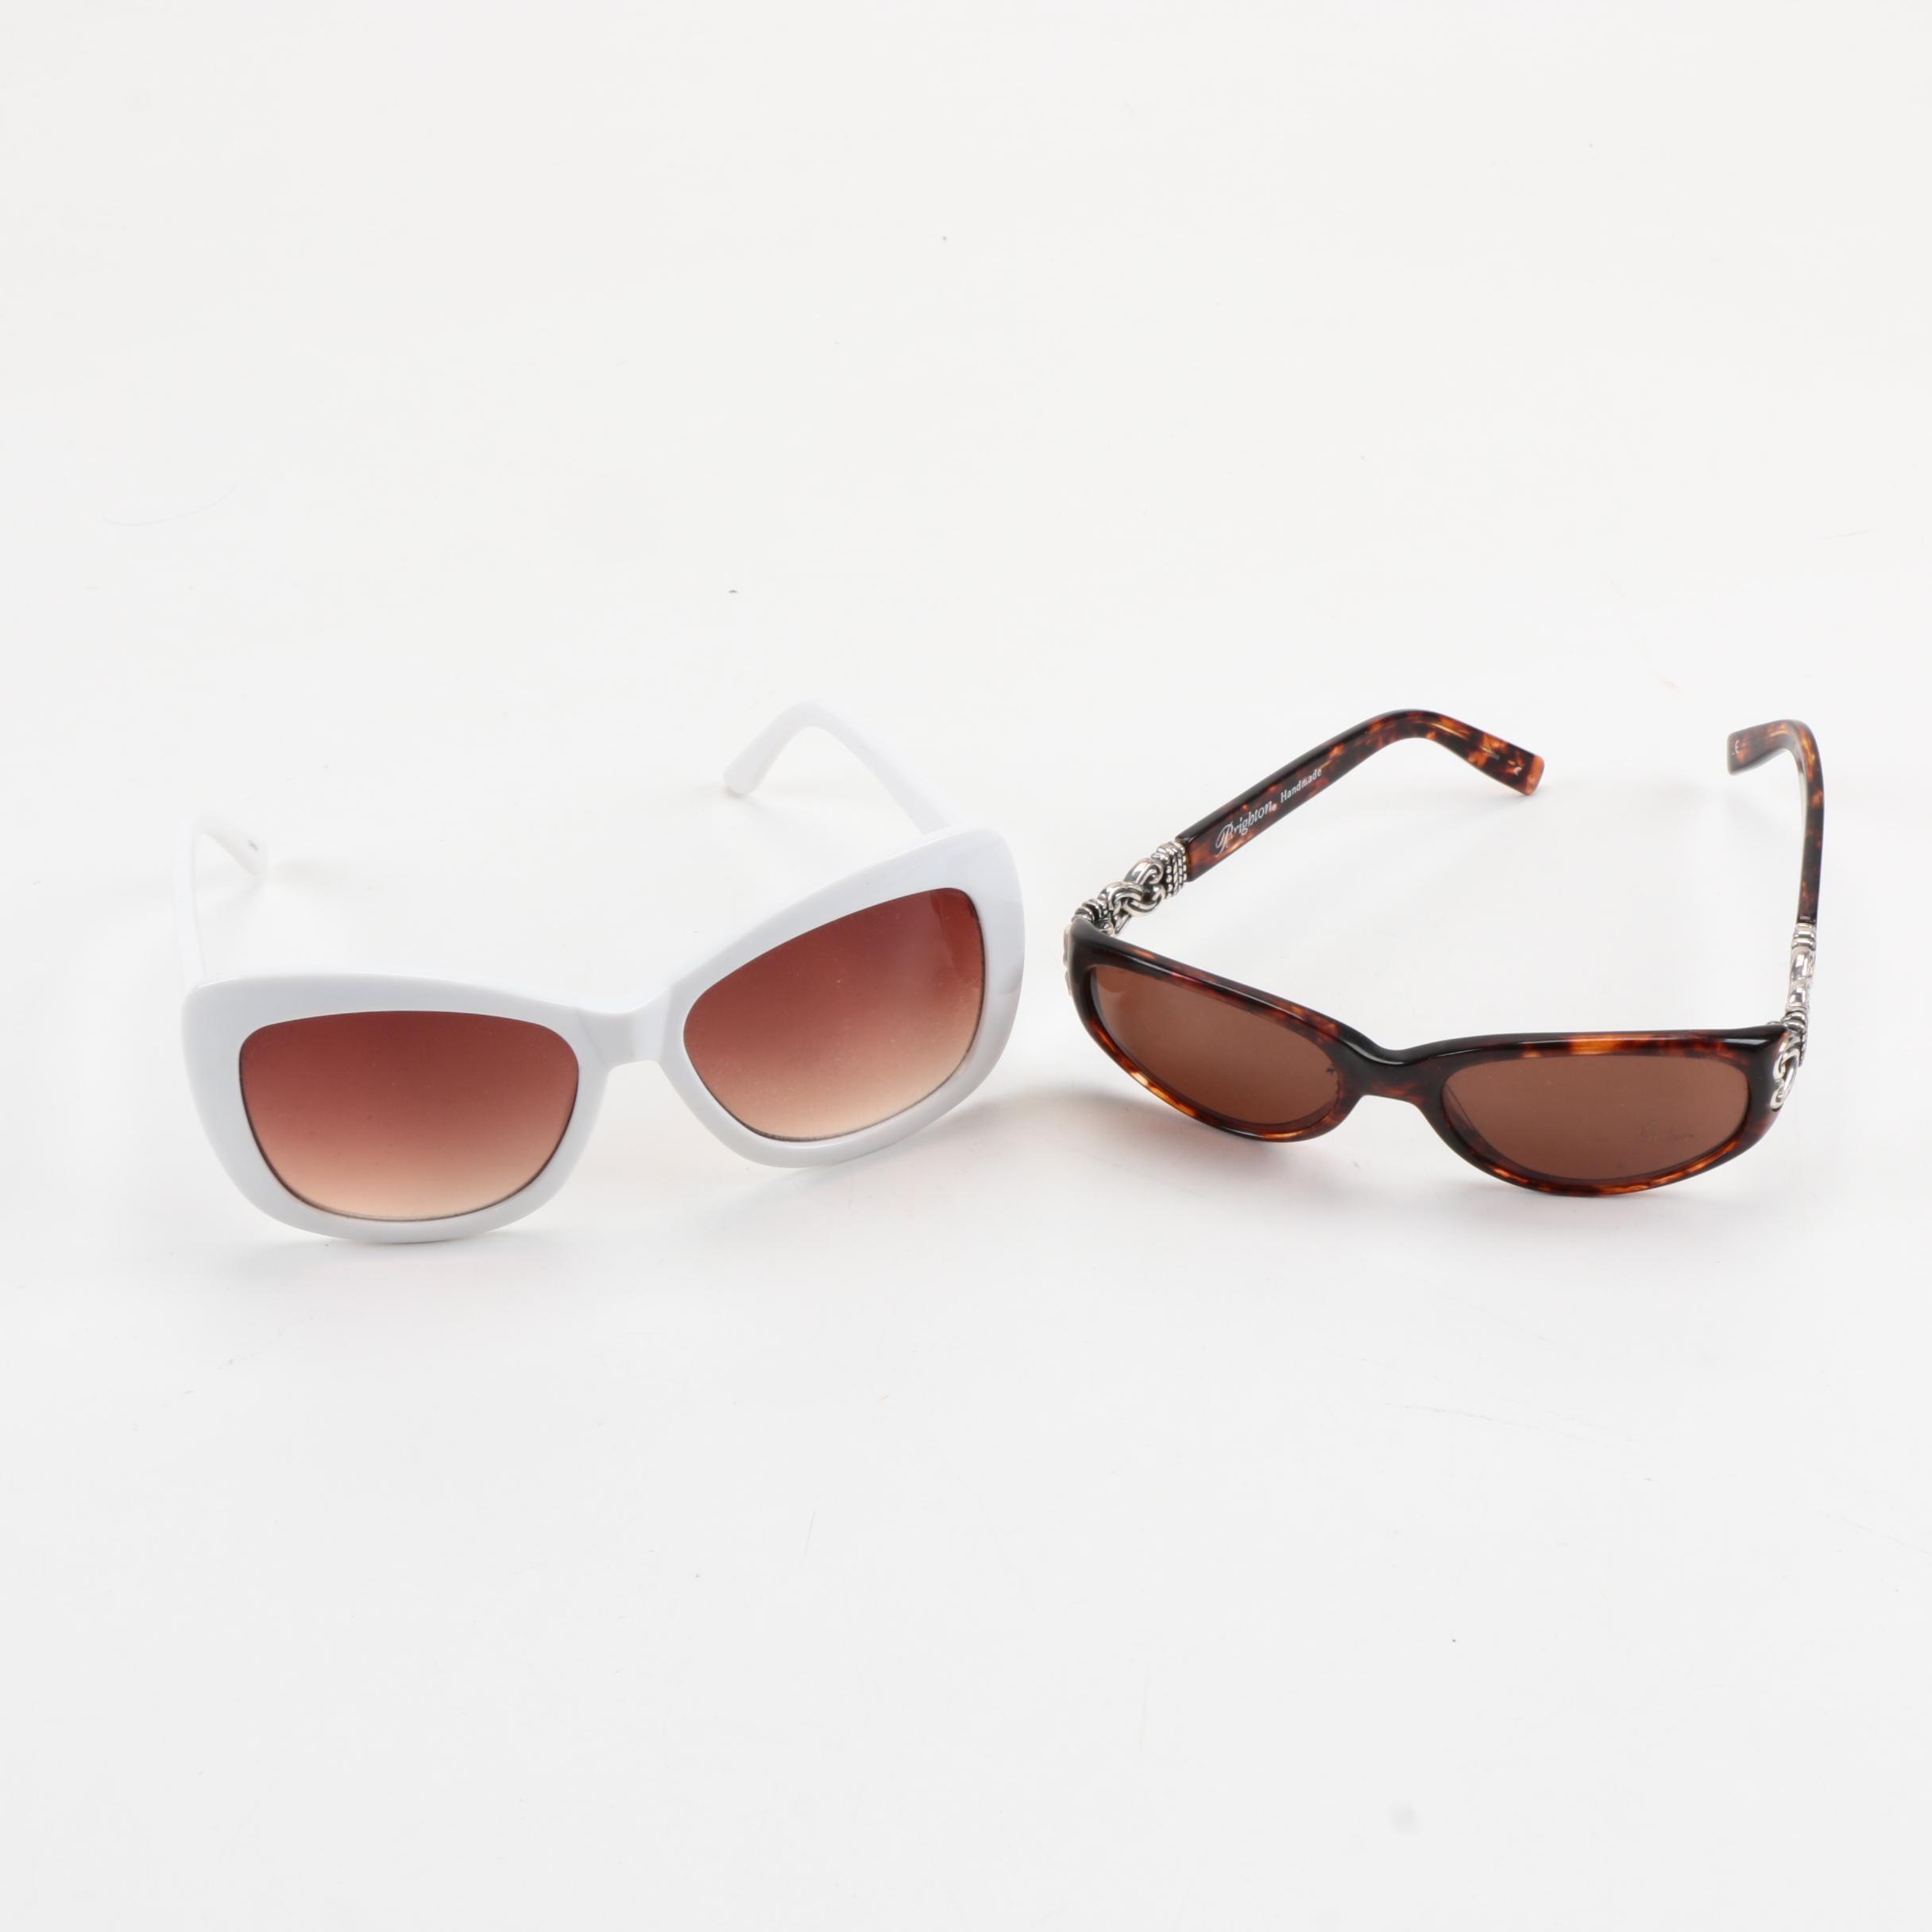 Women's Sunglasses Including Halston